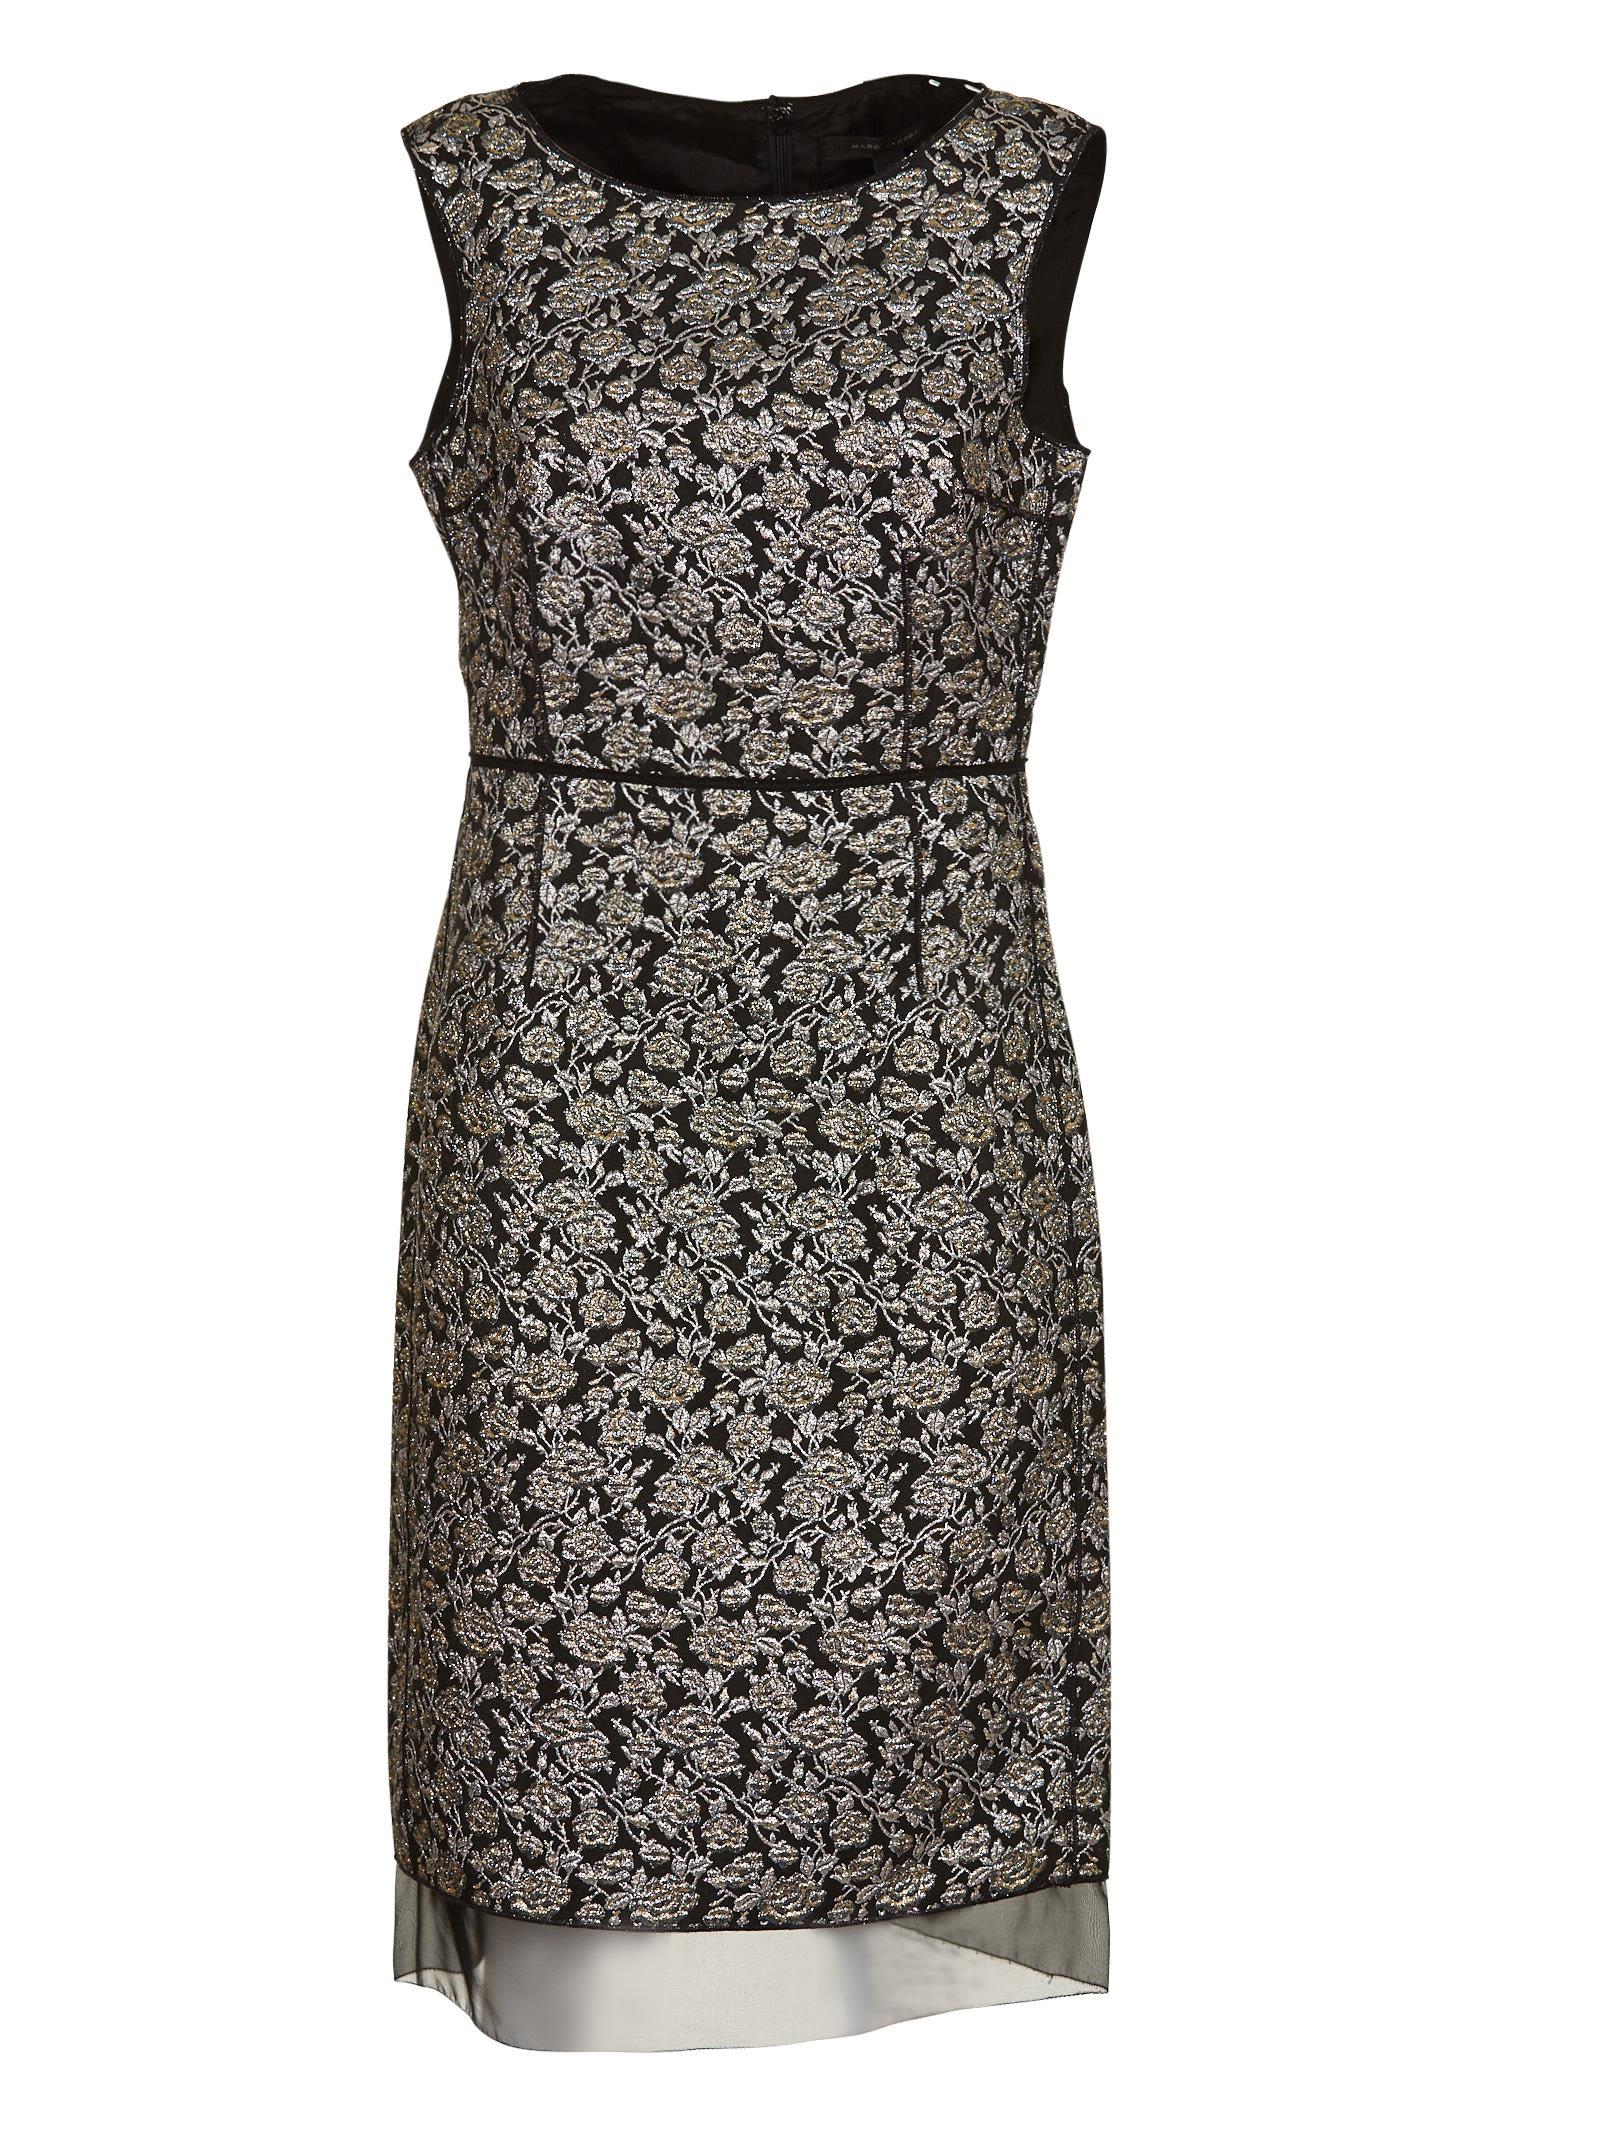 Marc Jacobs Brocade Dress